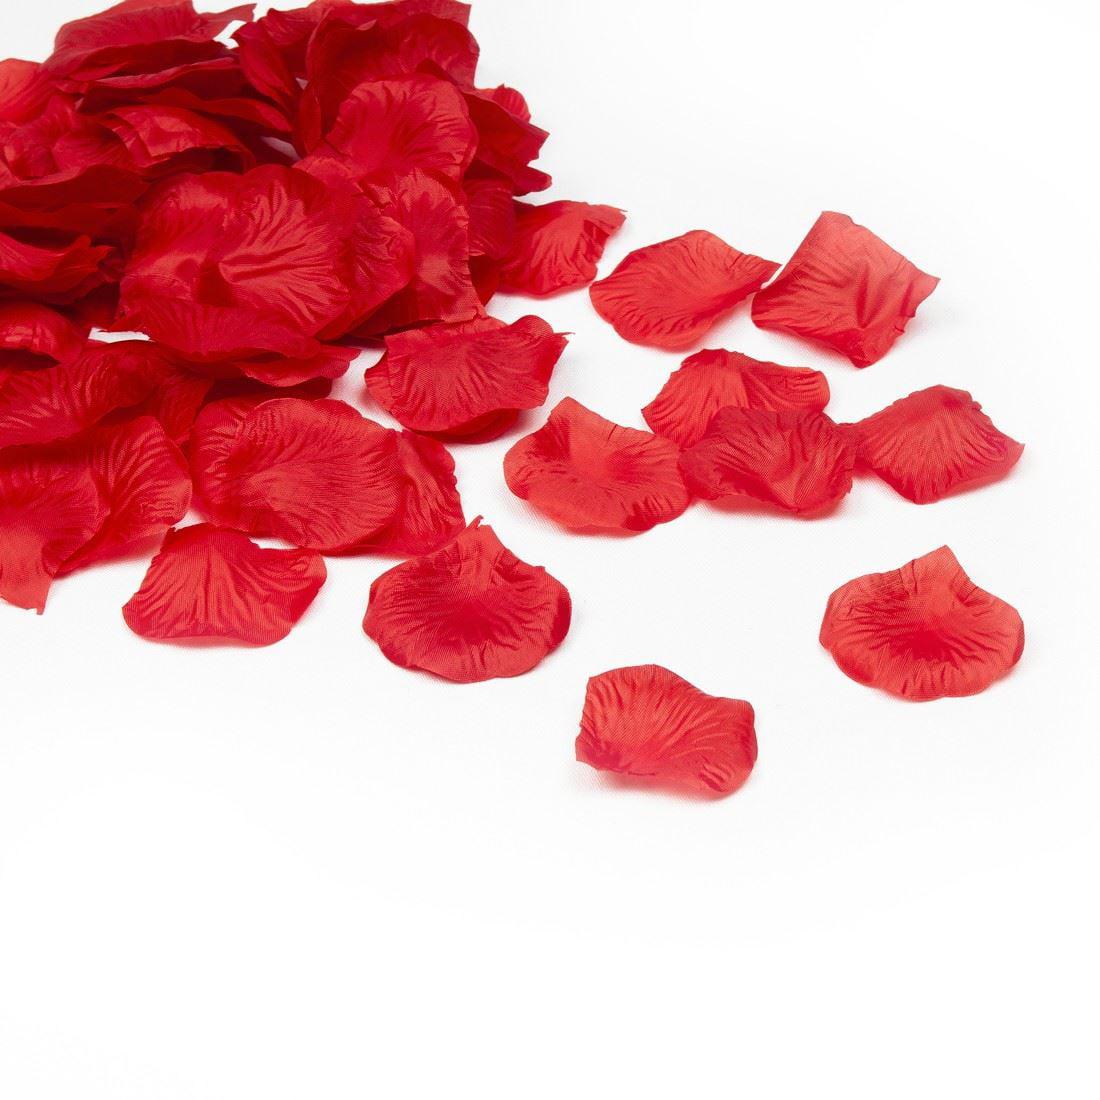 1000 Deep Red Quality Silk Rose Petals Confetti Wedding Decorations